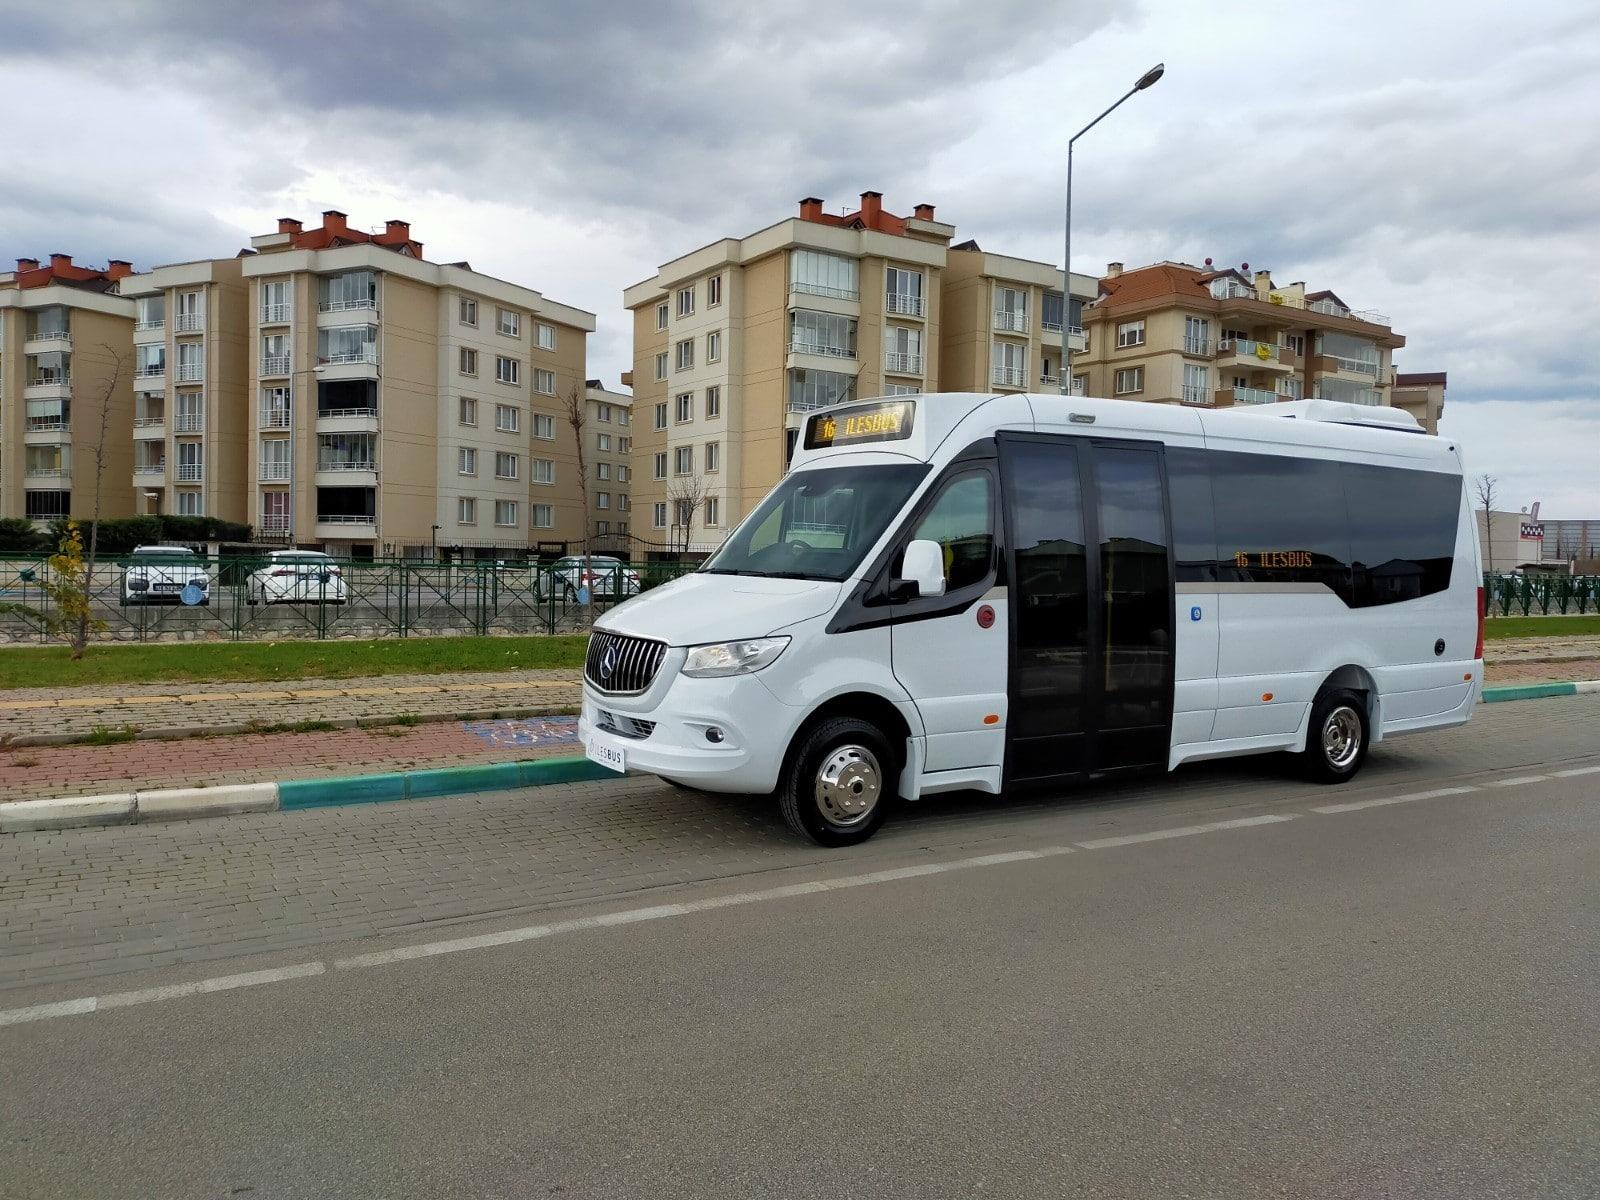 Ilesbus I-City low-floor minibus arrives in the UK